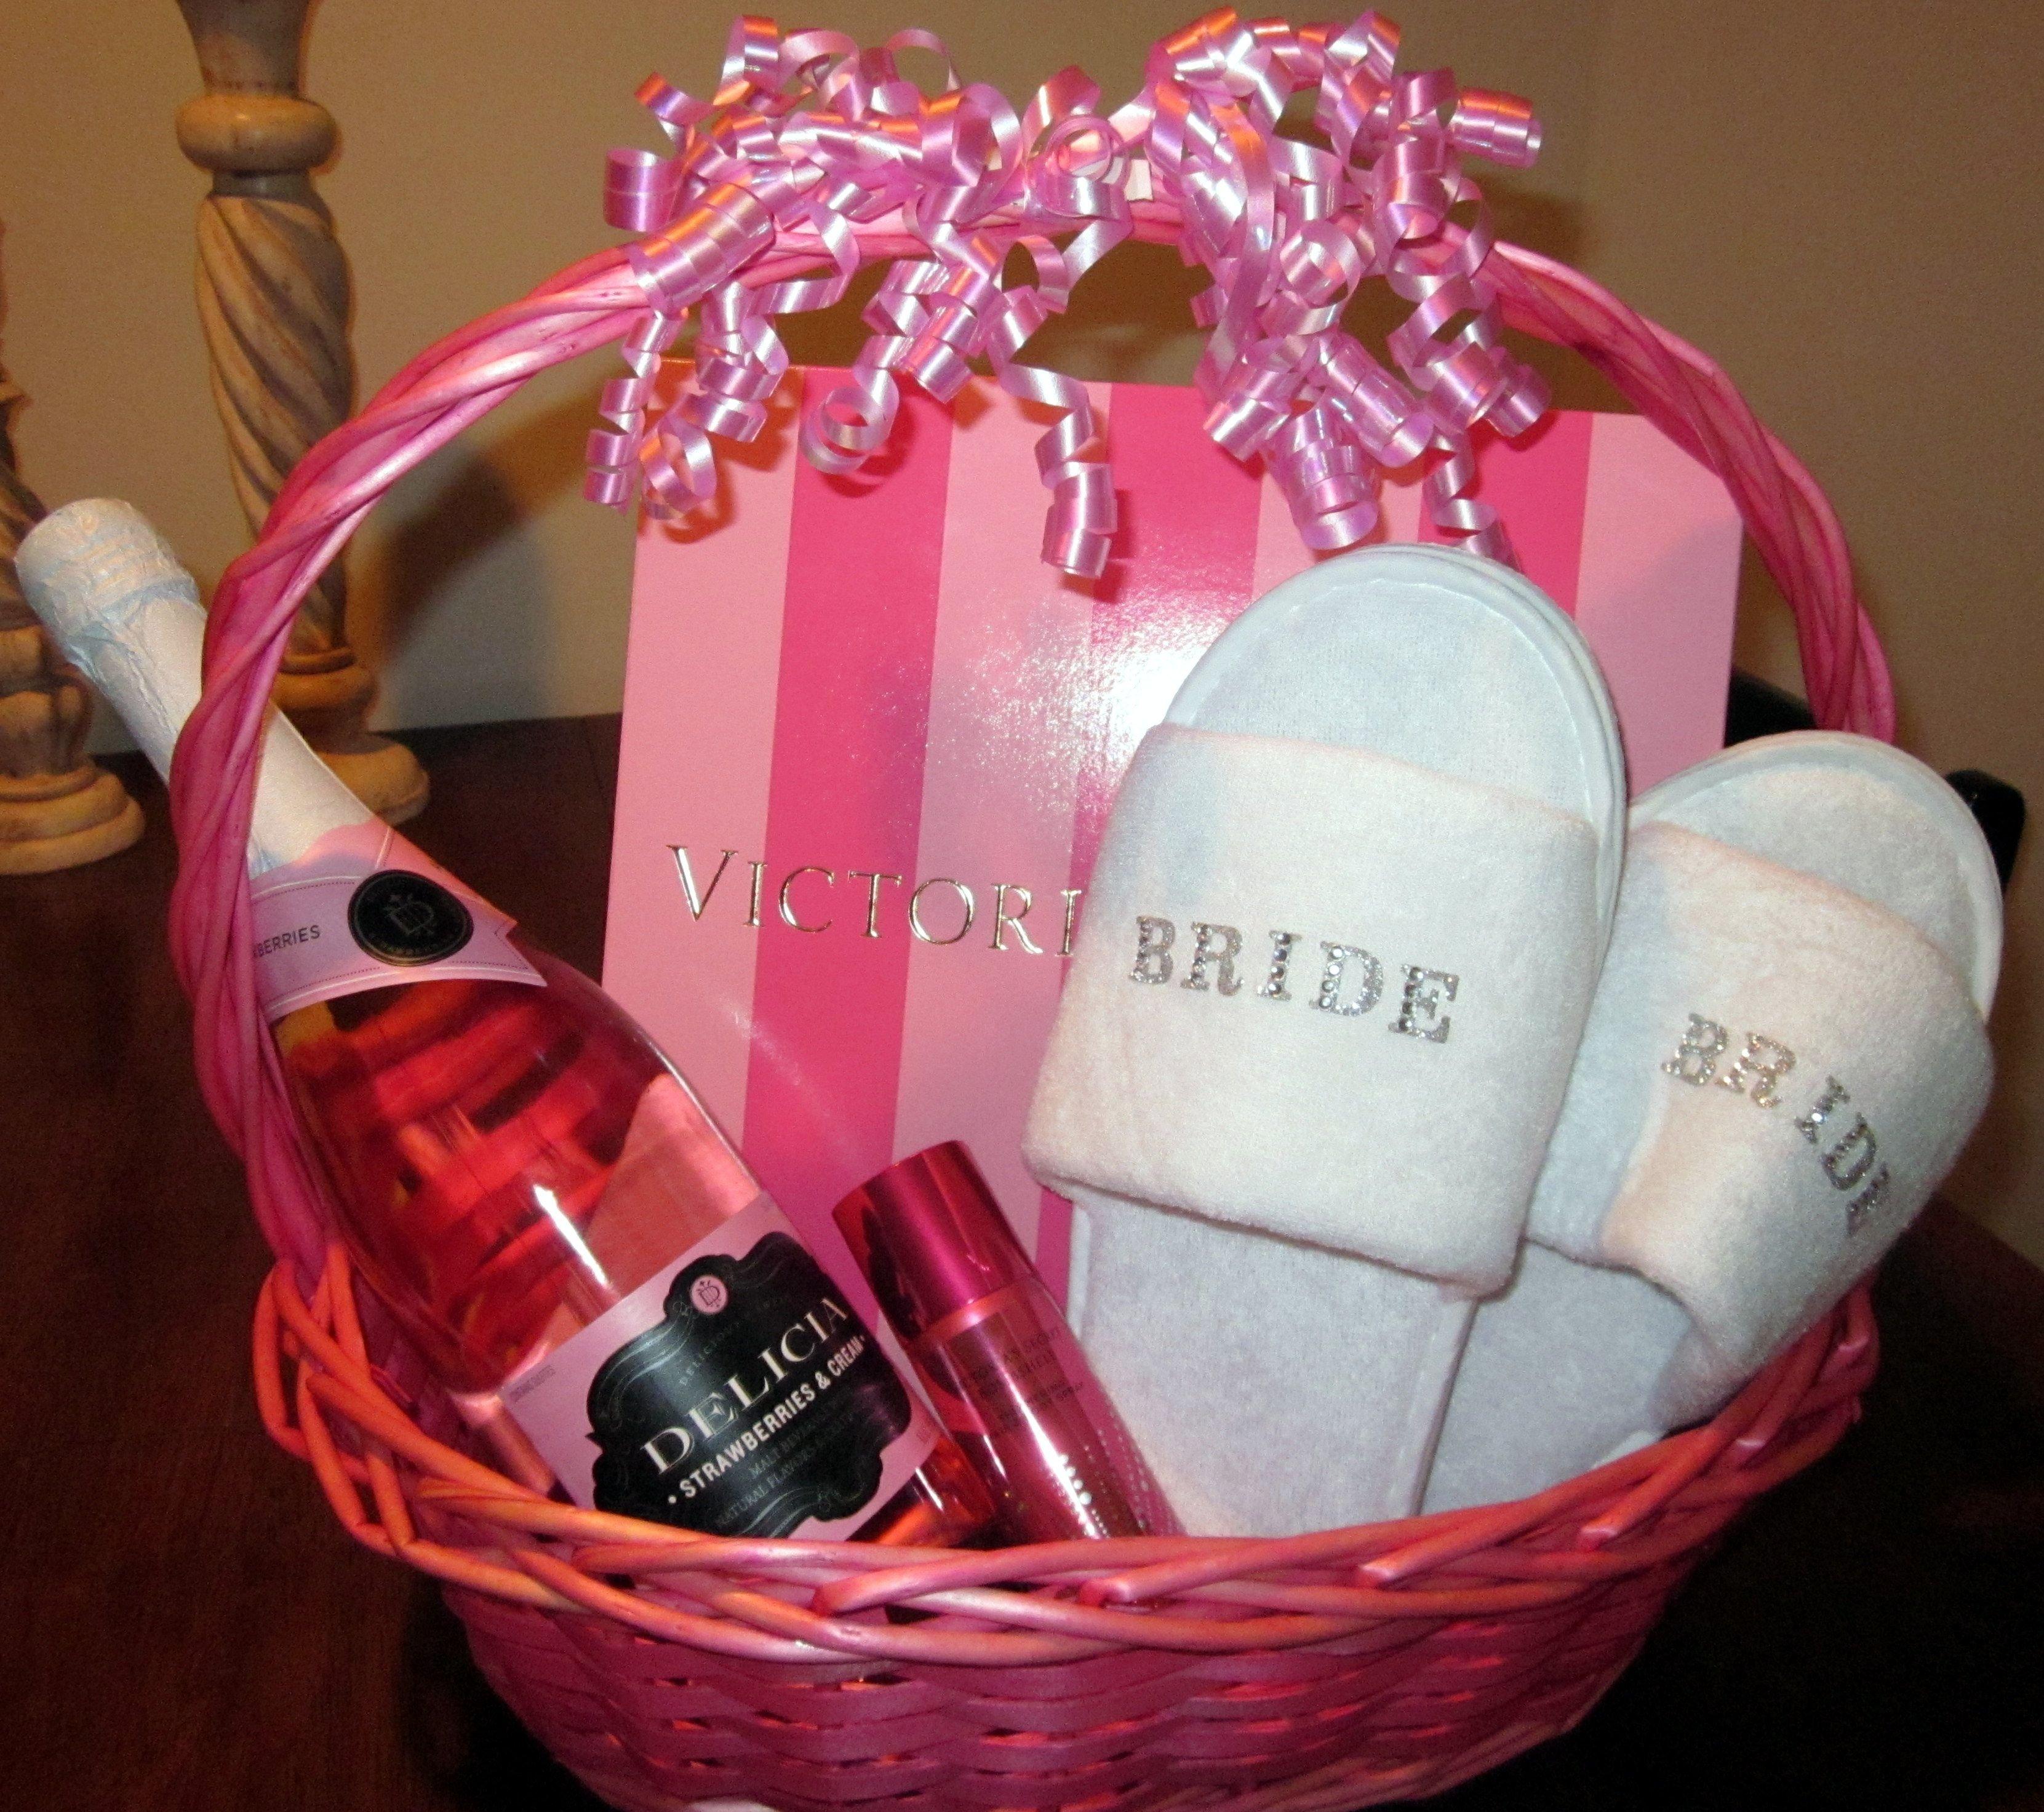 10 Beautiful Personal Bridal Shower Gift Ideas bridal shower gift ideas shell adore spa slippers wedding 7 2020